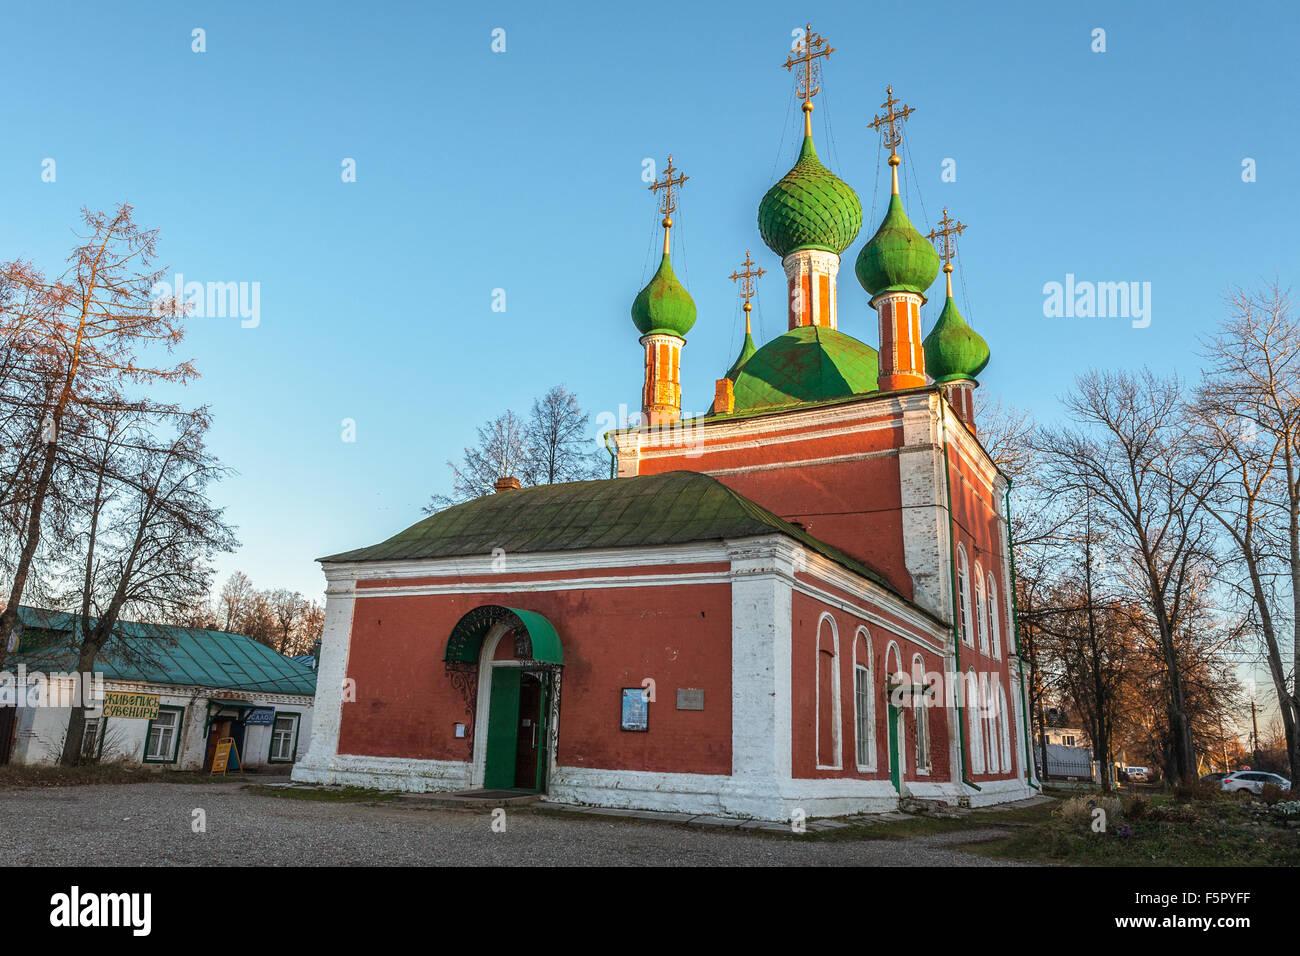 Pereslavl-Zalessky, Russia - November 07, 2015: Bogoroditsko-Sretensky Novodevichy Convent. Alexander Nevsky Church, - Stock Image